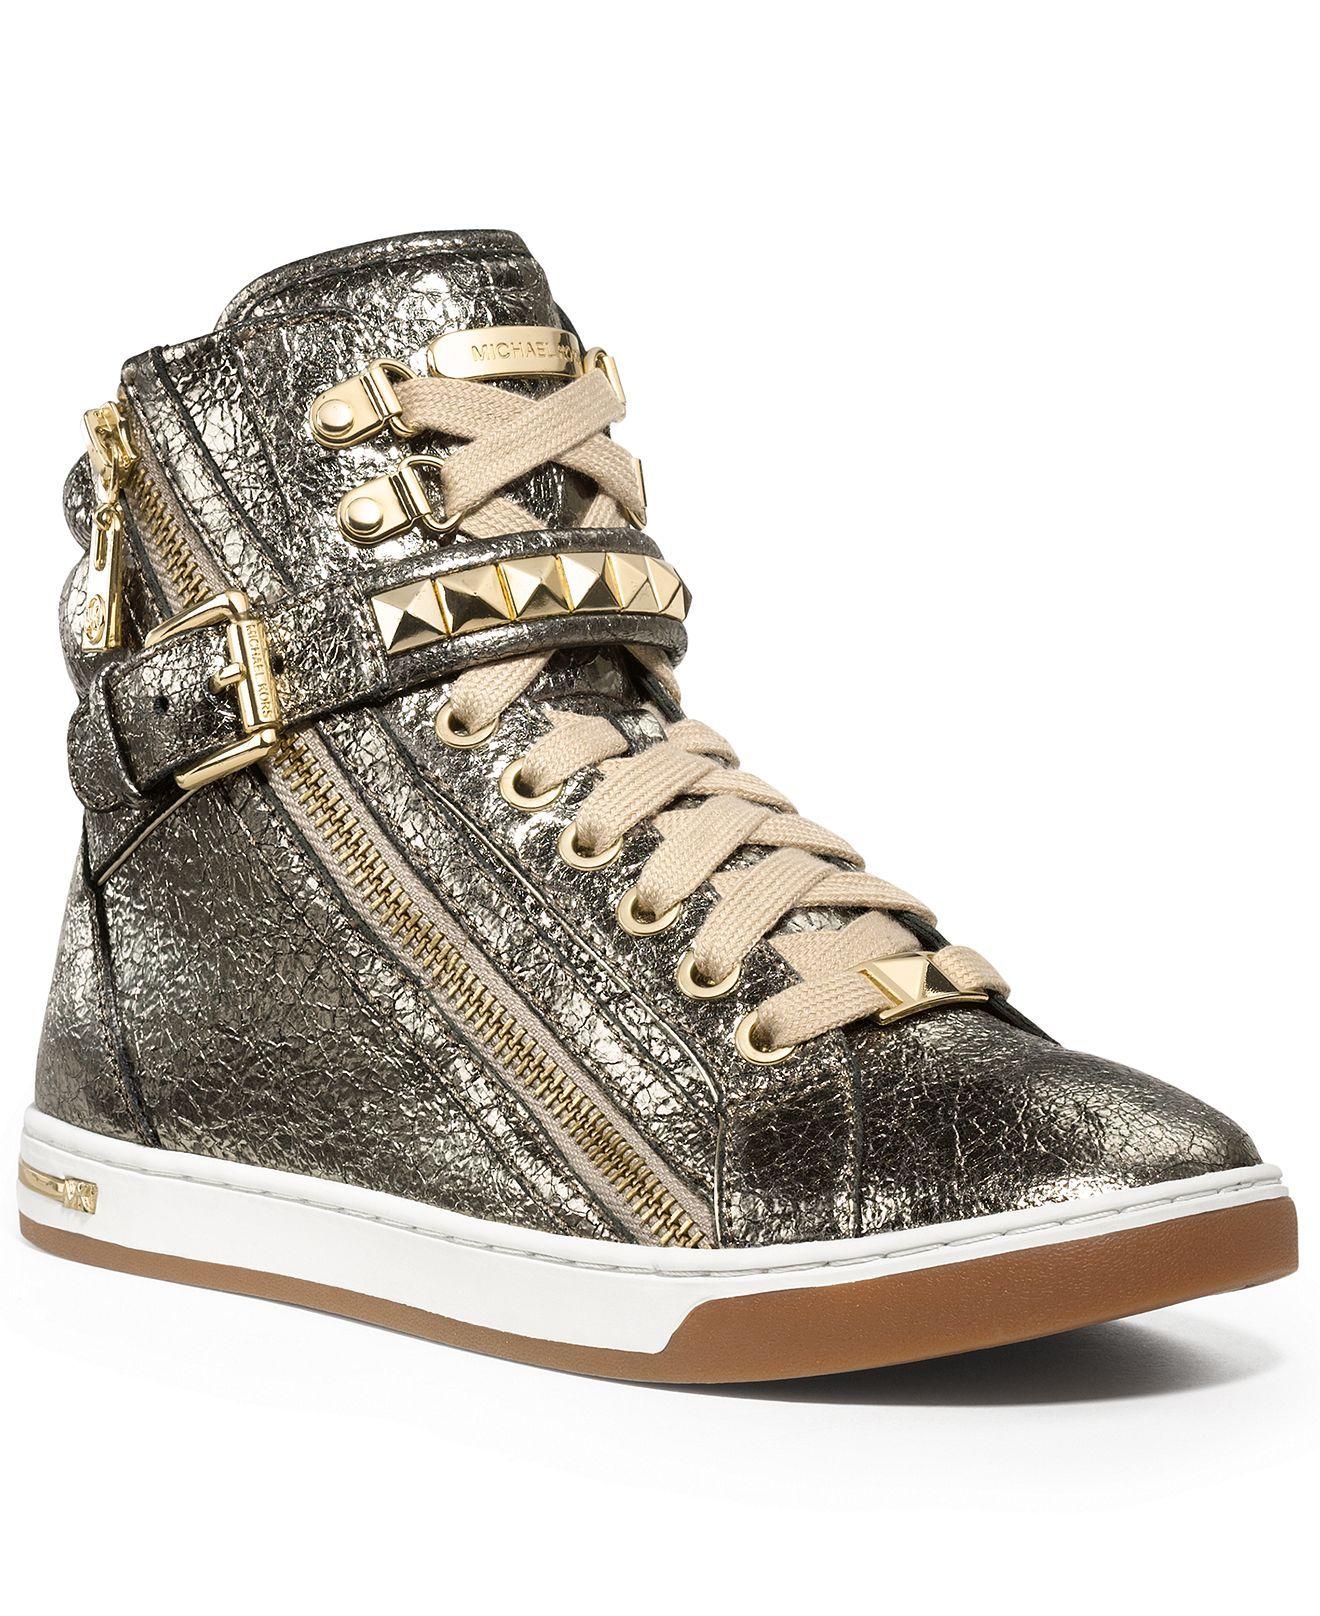 michael kors shoes near me